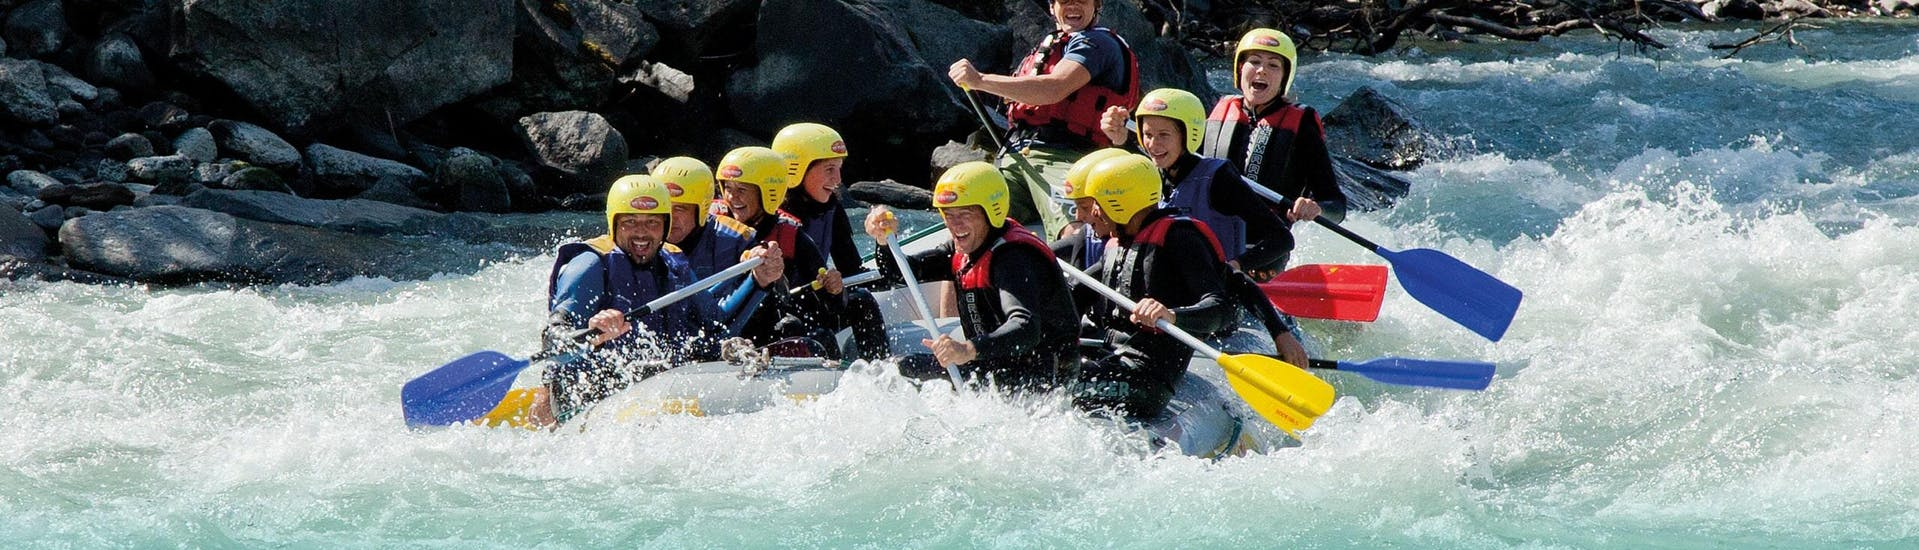 rafting-on-the-isel-river-for-beginners-adventure-park-osttirol-hero